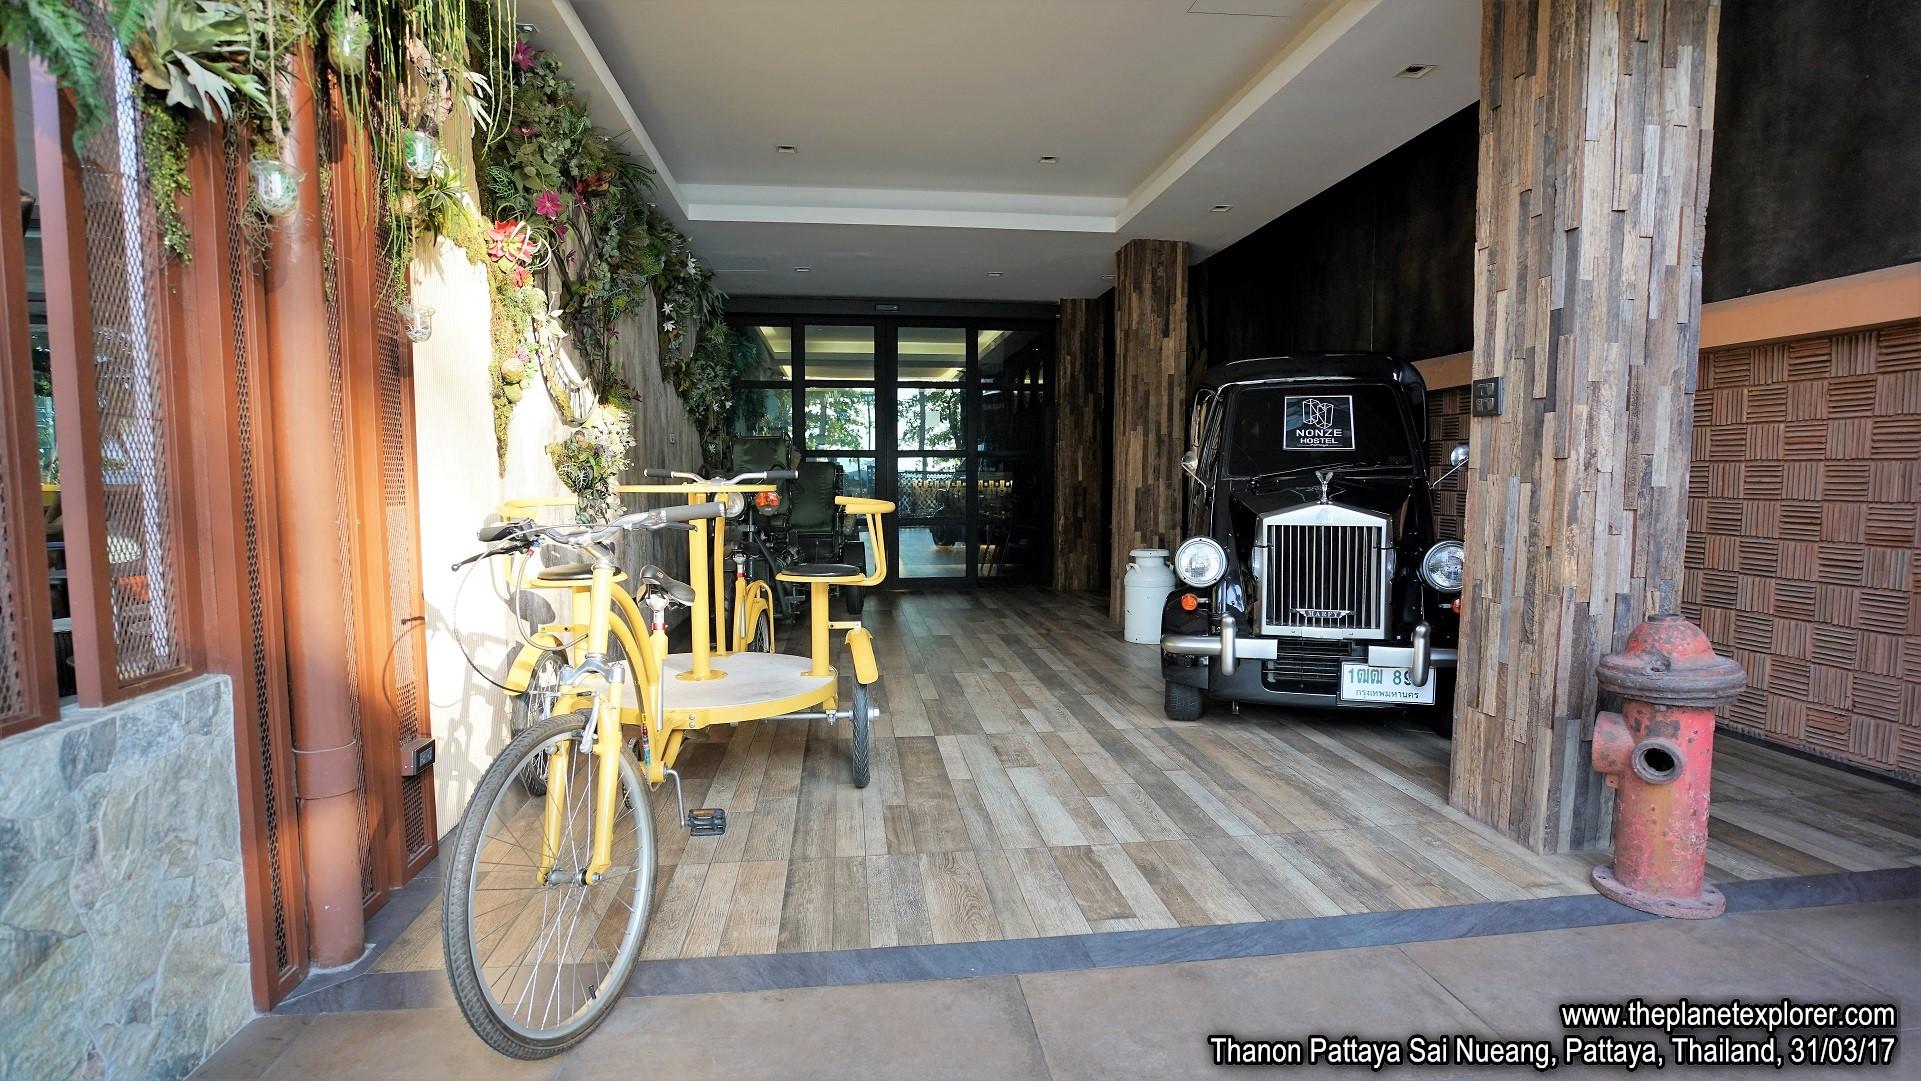 2017-03-31_1713_Thailand_Pattaya_Thanon Pattaya Sai Nueang_DSC03975_s7R2_LR_@